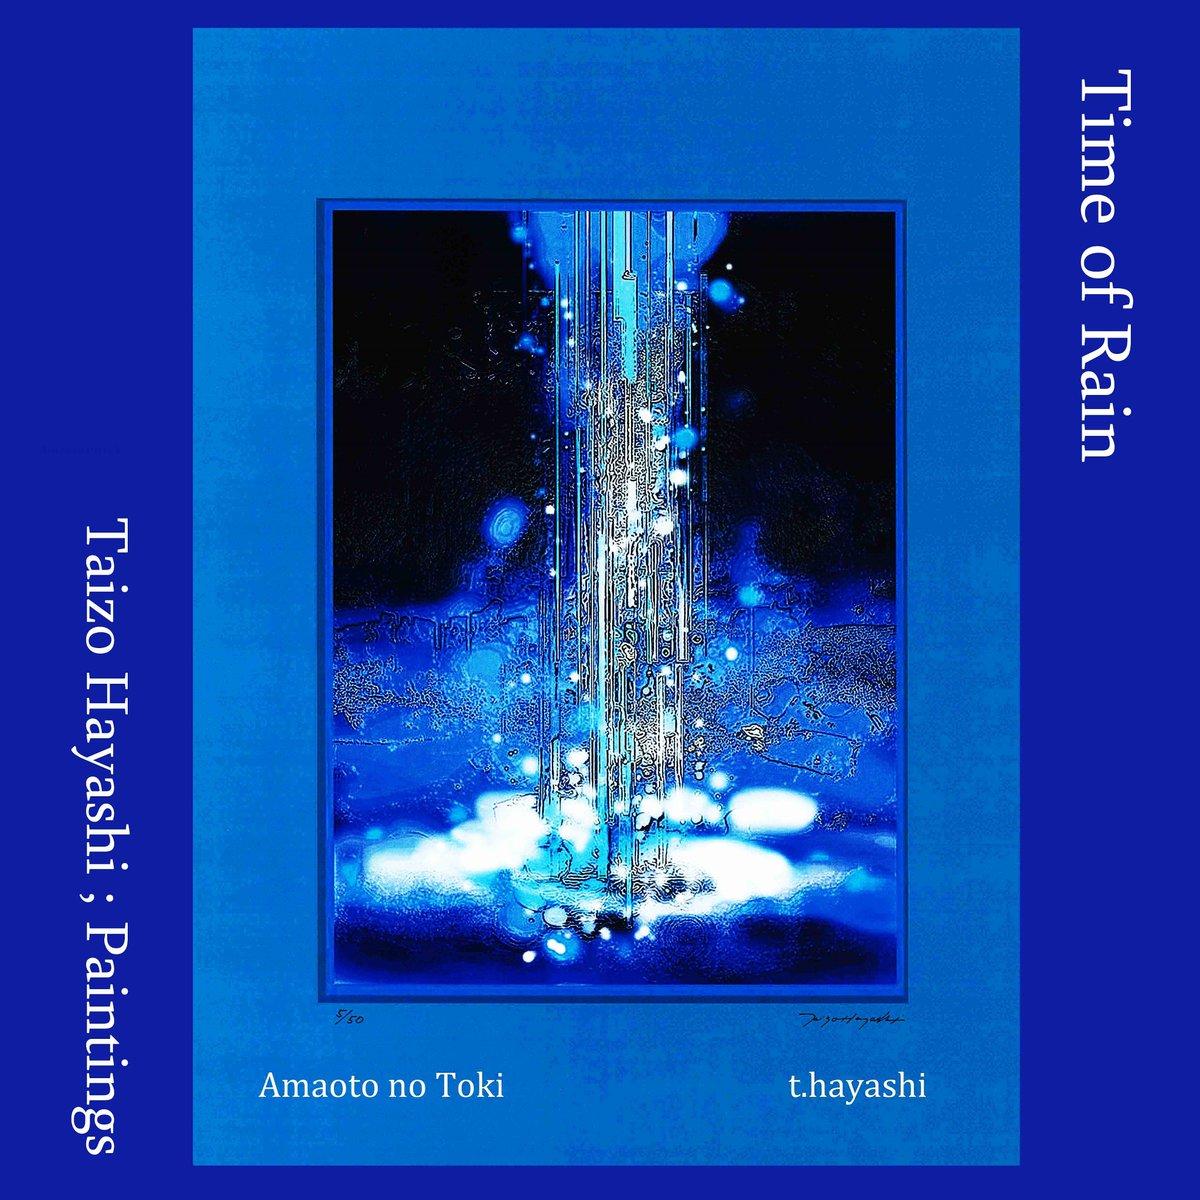 Time of Rain ;  Taizo Hayashi ; Japan    #art #arte #abstractpainting #digitalpainting #digitalart  #print #blue #rain #絵描きさんと繫がりたい #抽象画  #デジタル絵画 #デジタル印刷 #絵画  #デジタルアートpic.twitter.com/tXI9uYoAt0